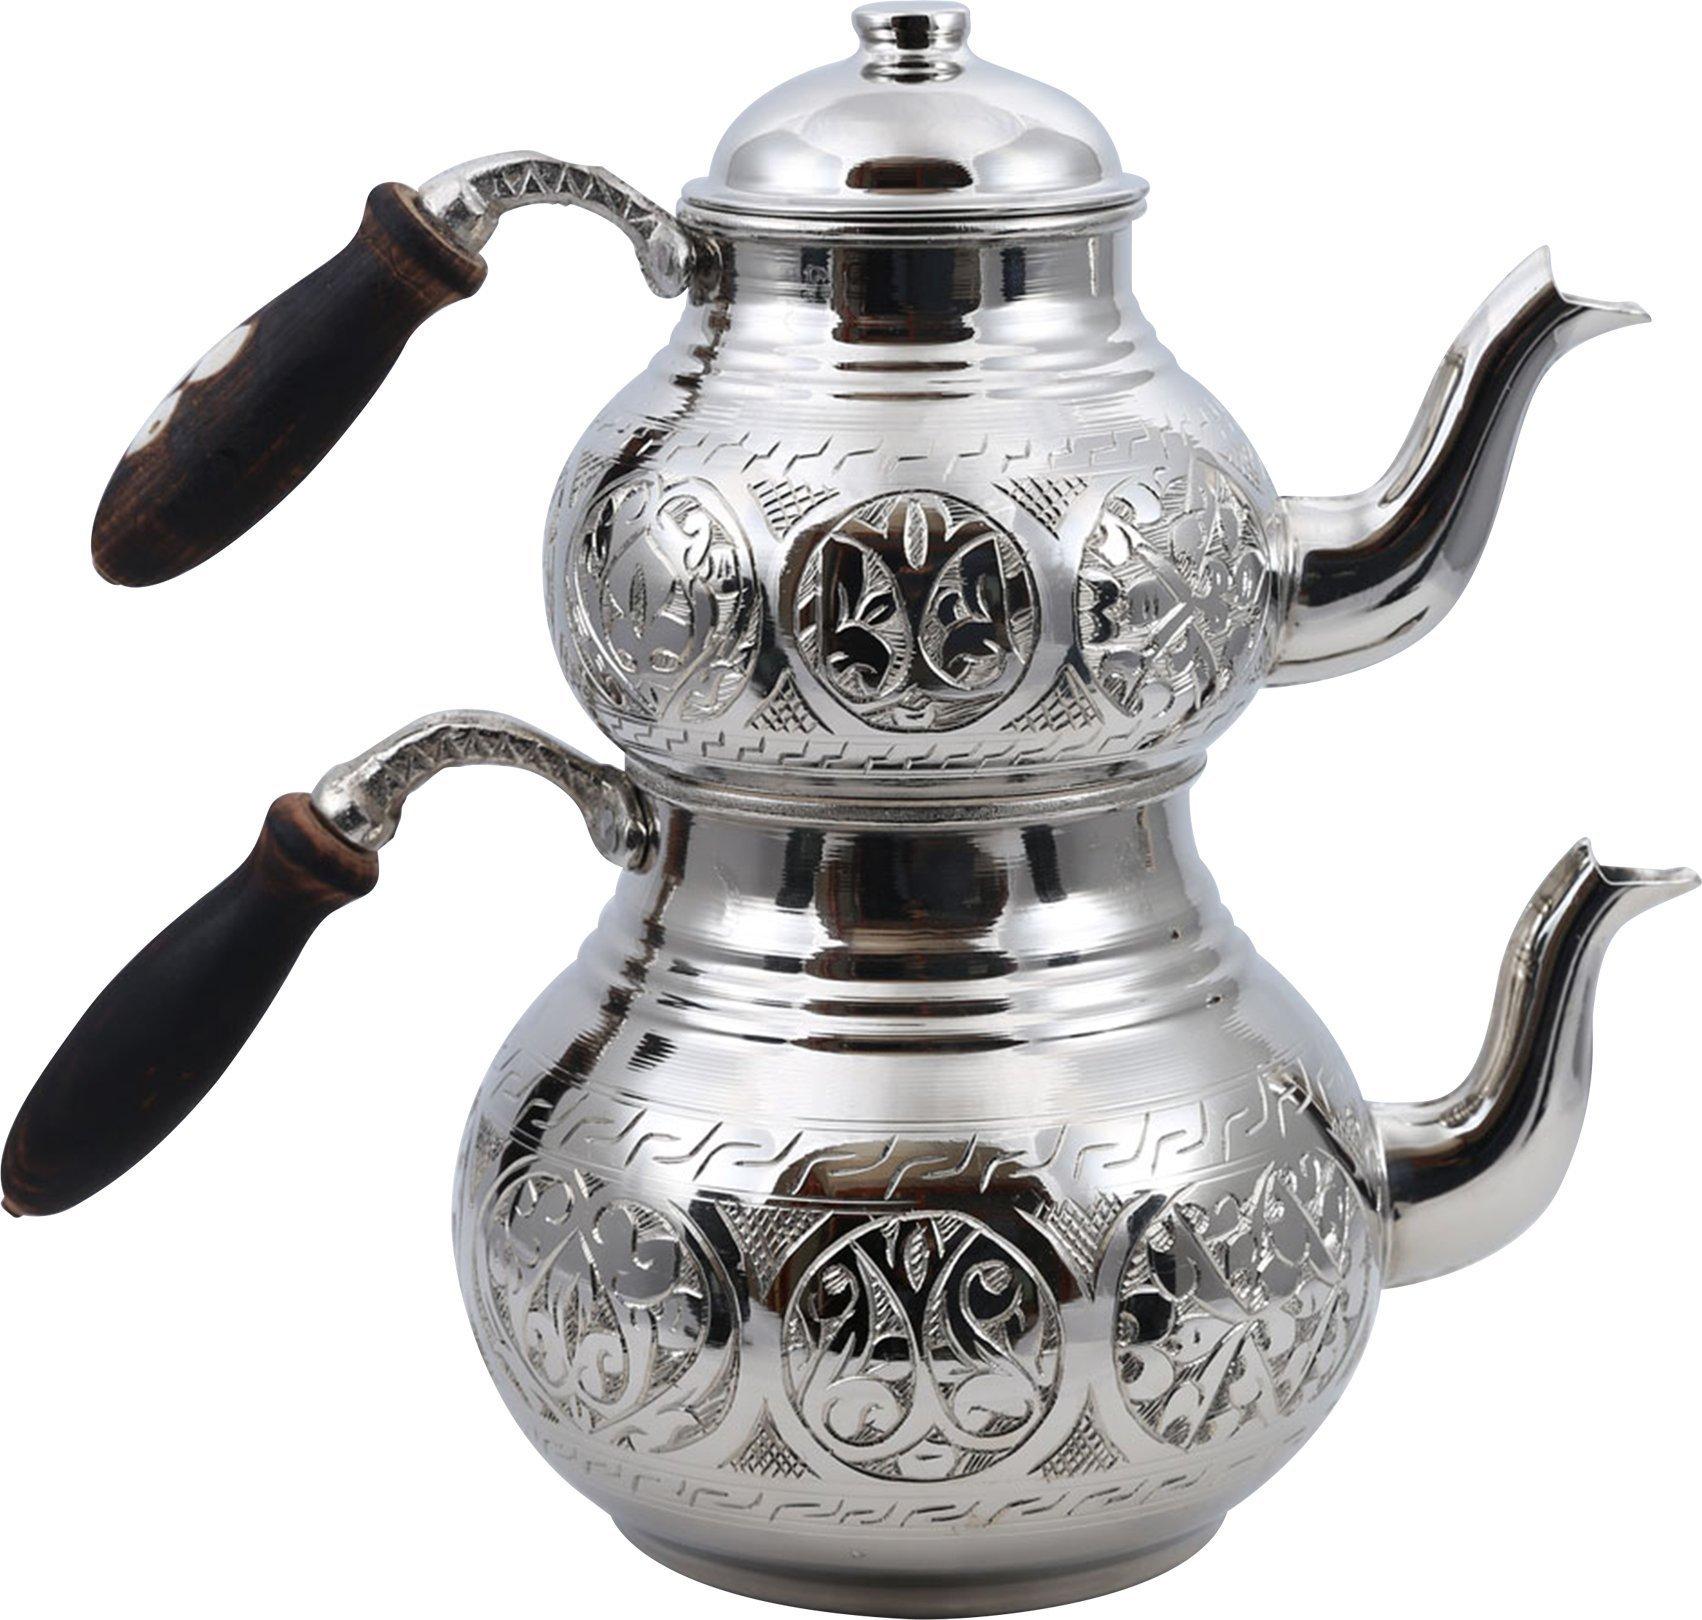 Handcrafted Copper Turkish Tea Pot Set, Tea Maker, Samovar, Ottoman Antique Handmade Tea Pot Kettle, Traditional Turkish Black Tea Maker-(TP-104)